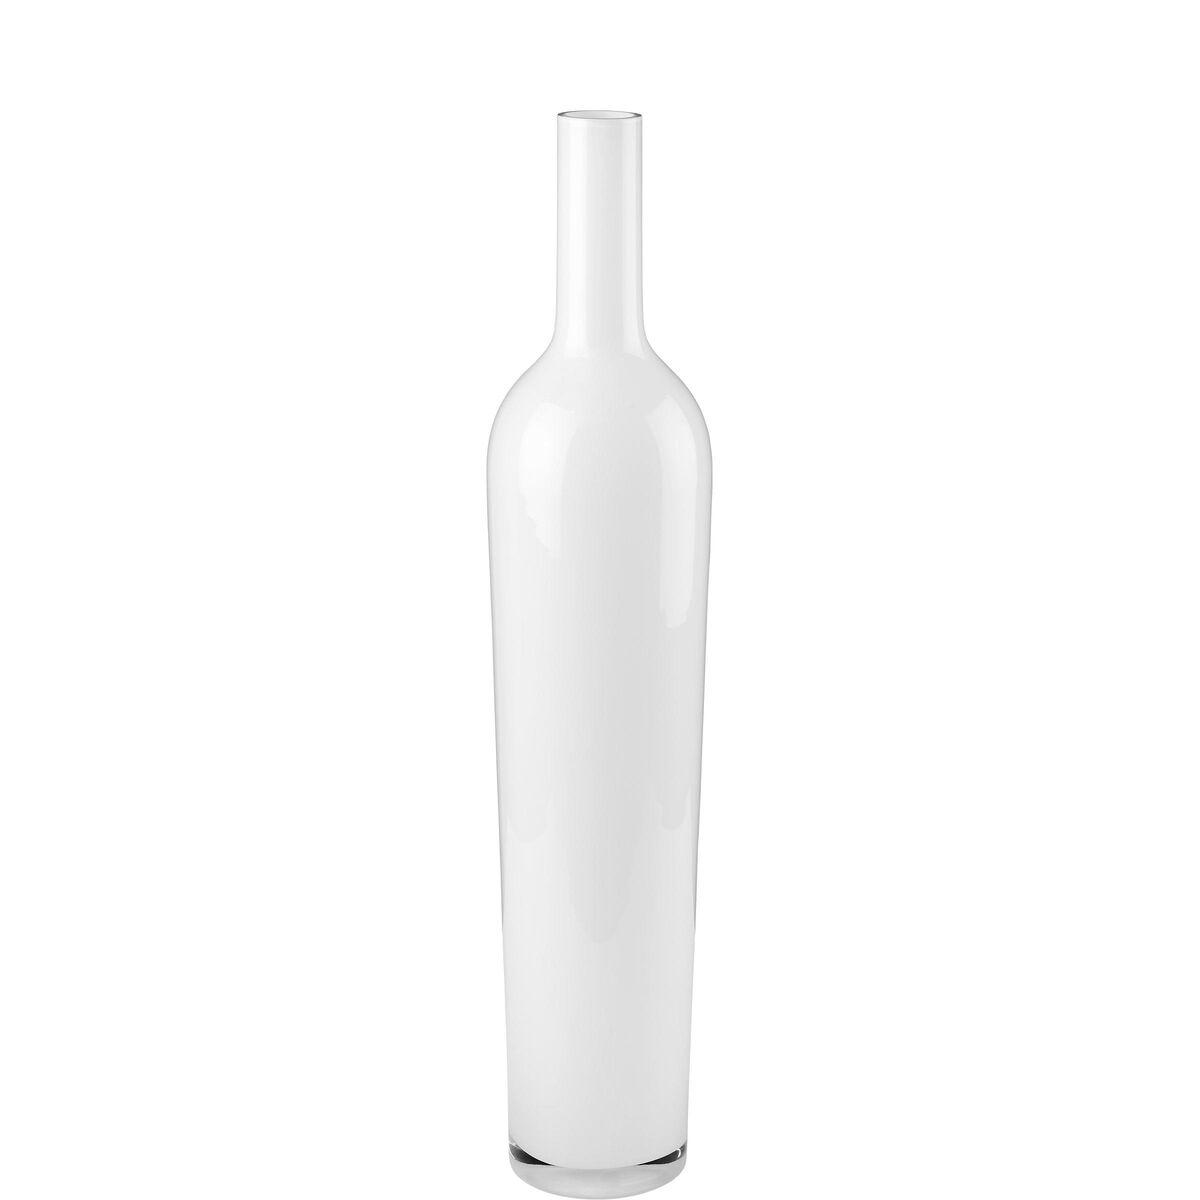 AMALIA Glas Bodenvase weiß L80cm